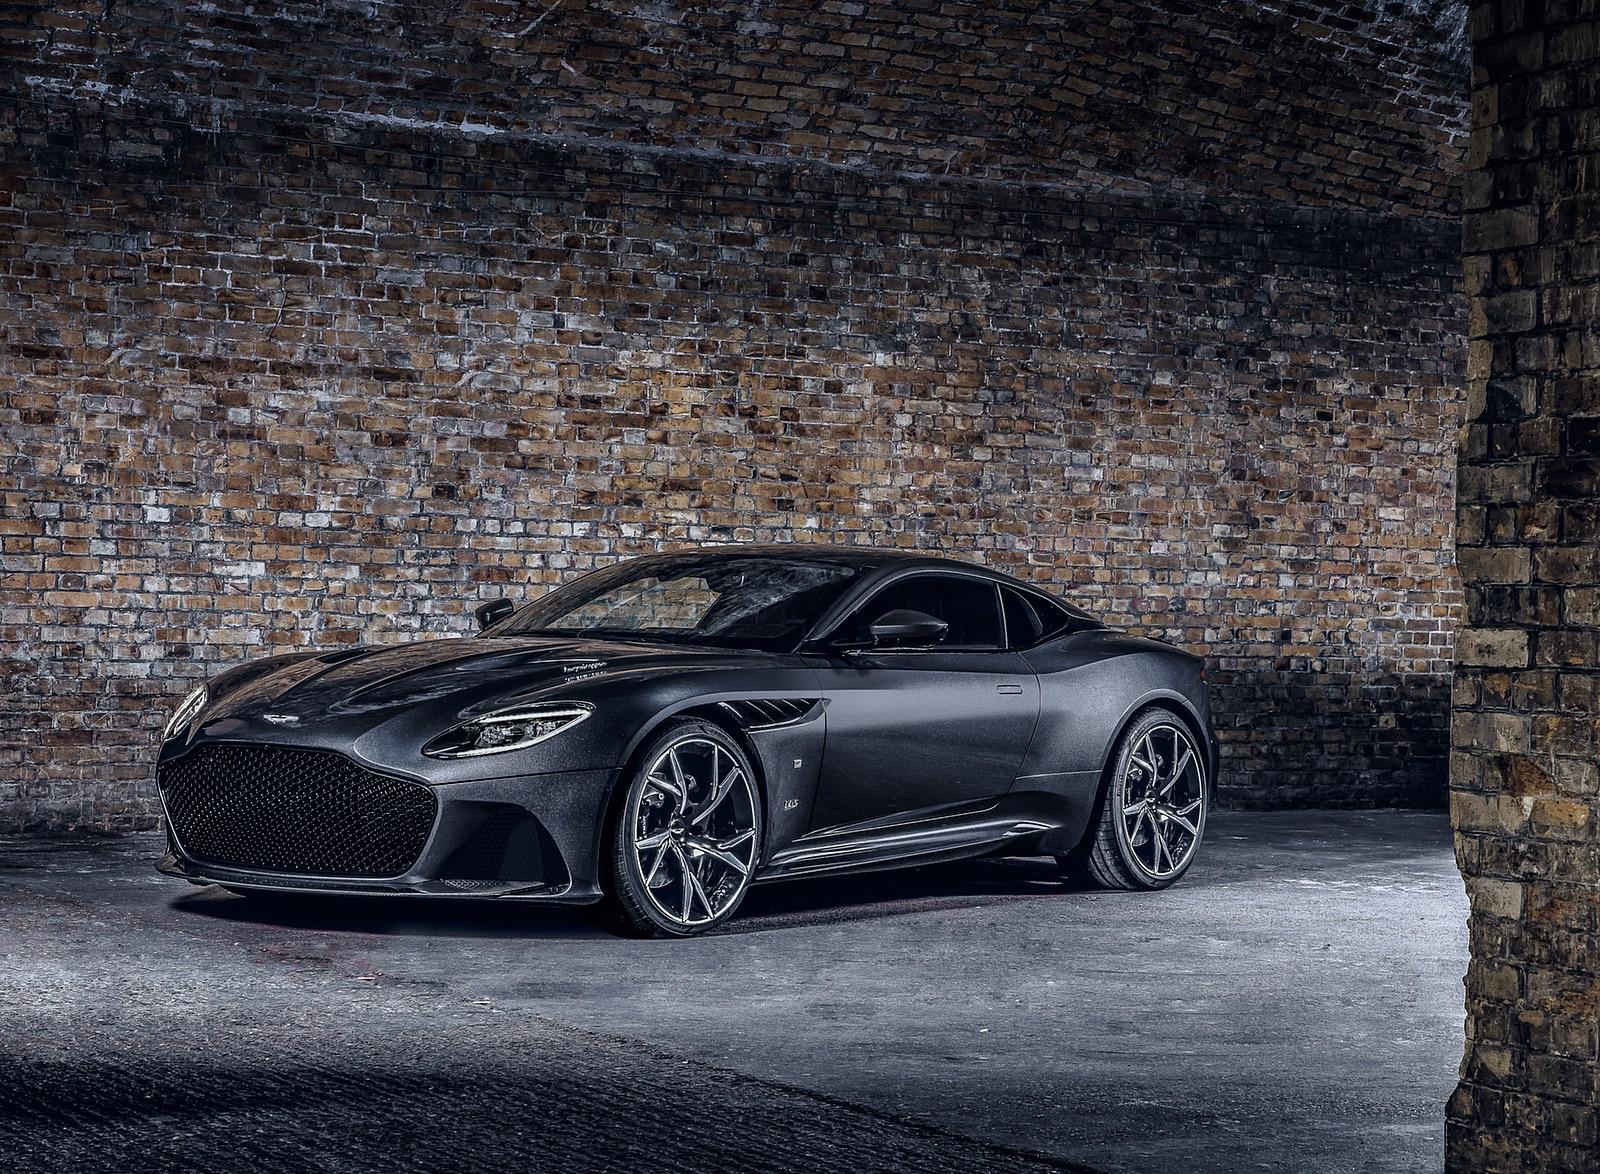 2021 Aston Martin DBS Superleggera 007 Edition Front Three-Quarter Wallpapers (1)